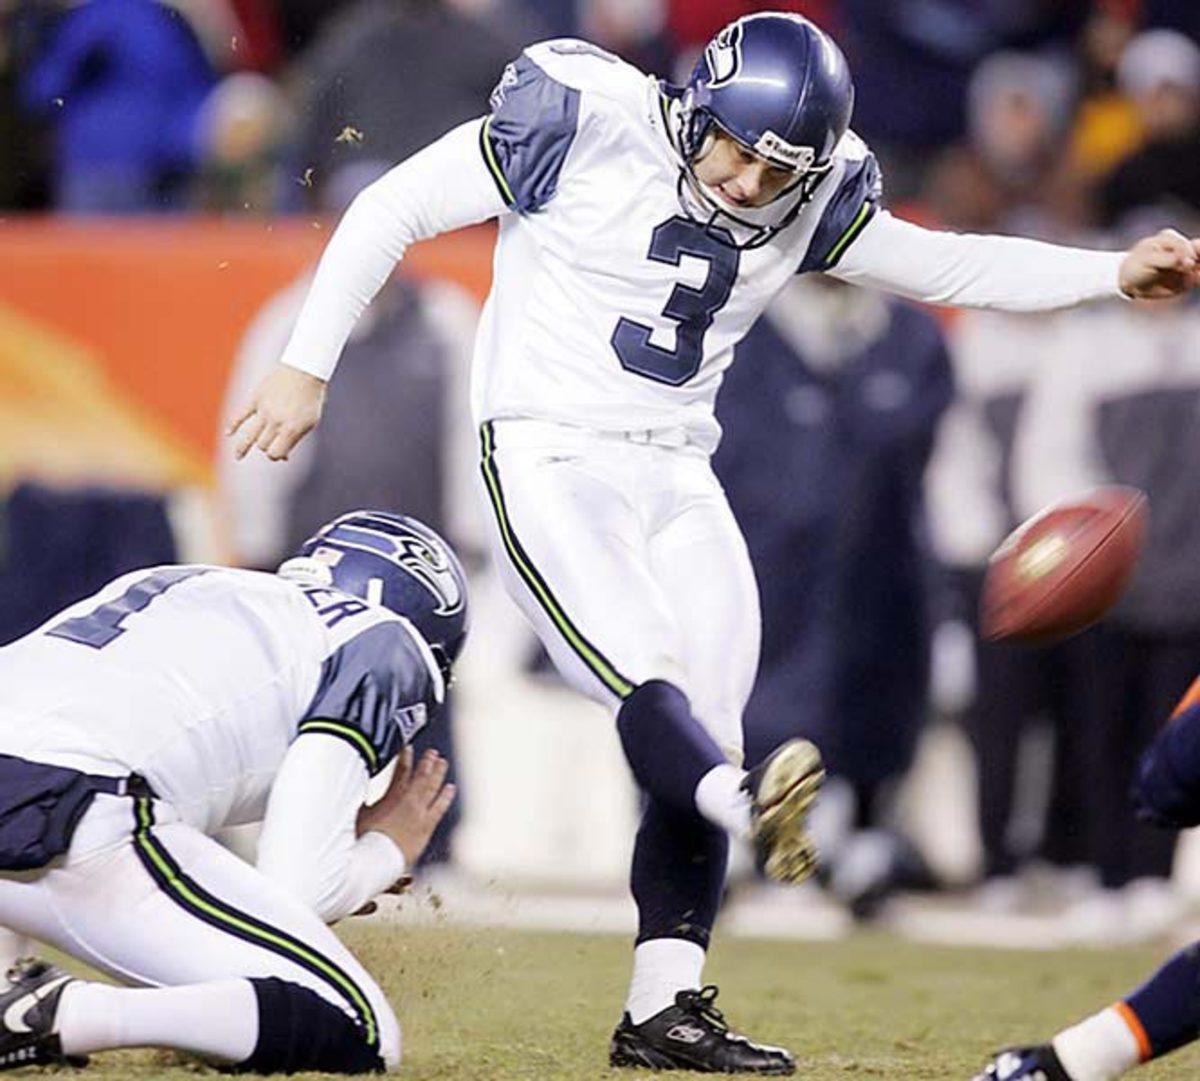 Seahawks 23, Broncos 20